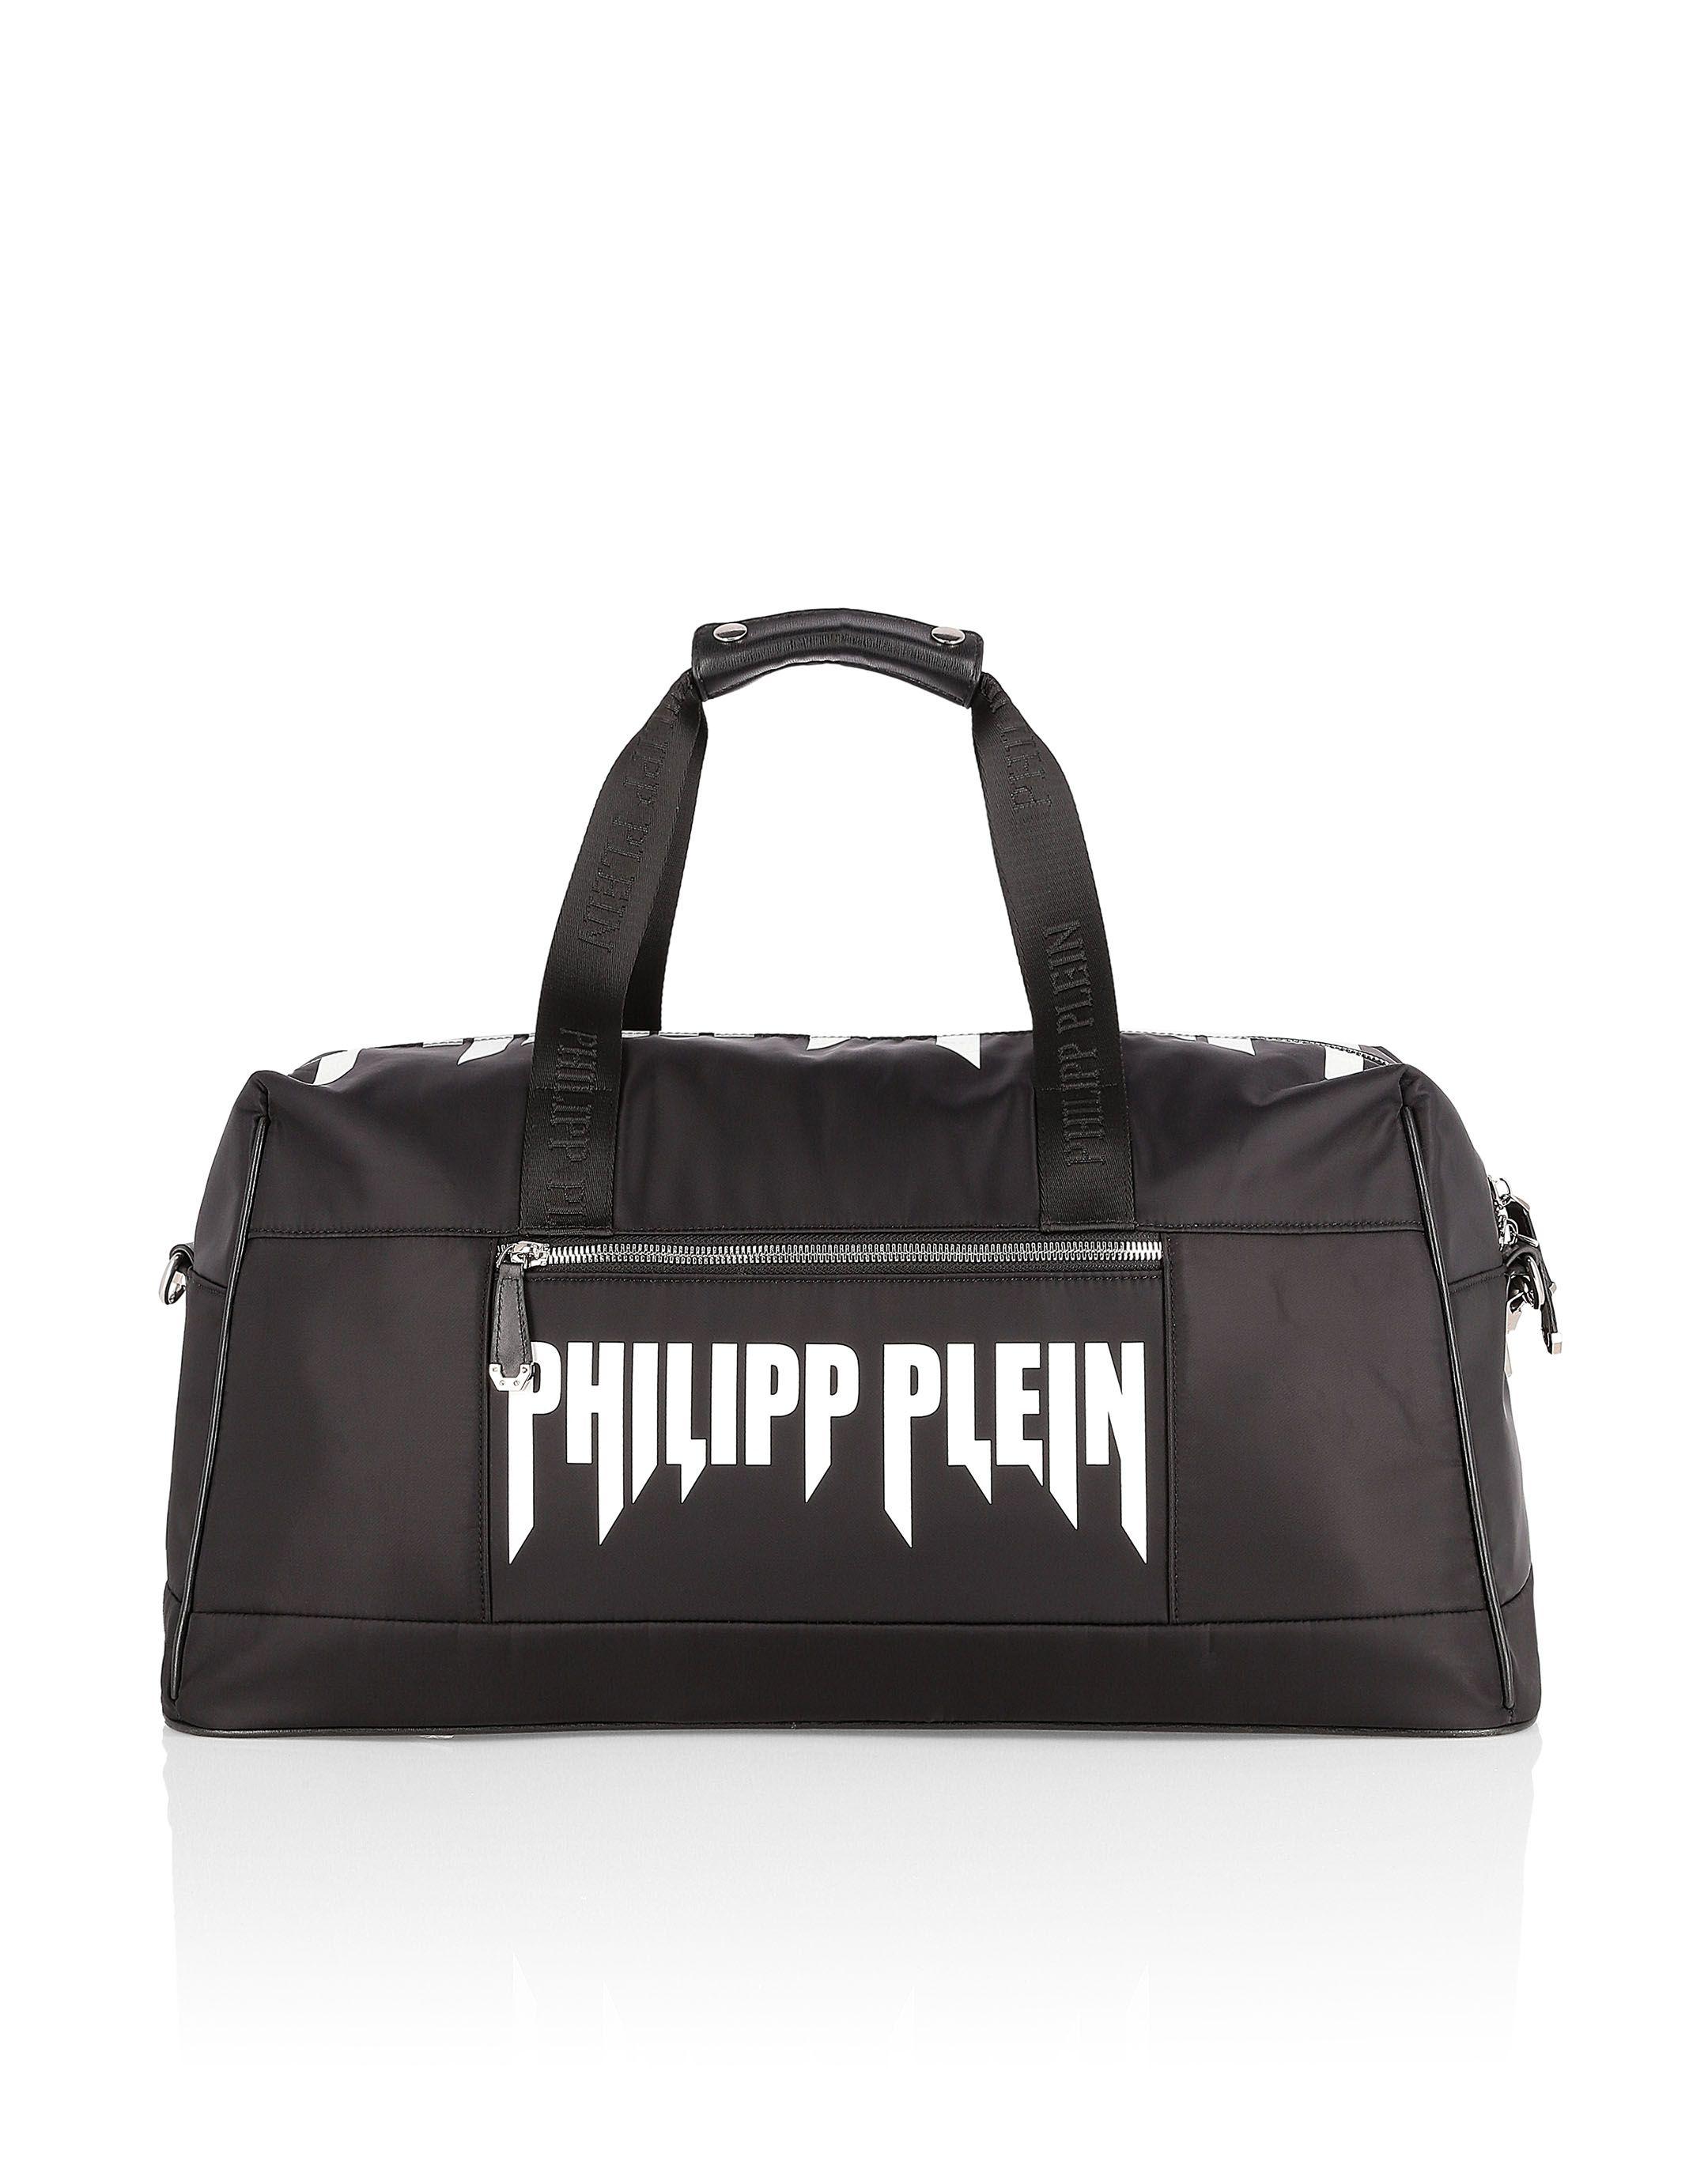 85c8d17ec9 PHILIPP PLEIN SPORT BAG ROCK PP. #philippplein #bags #lining #polyester  #nylon #cotton